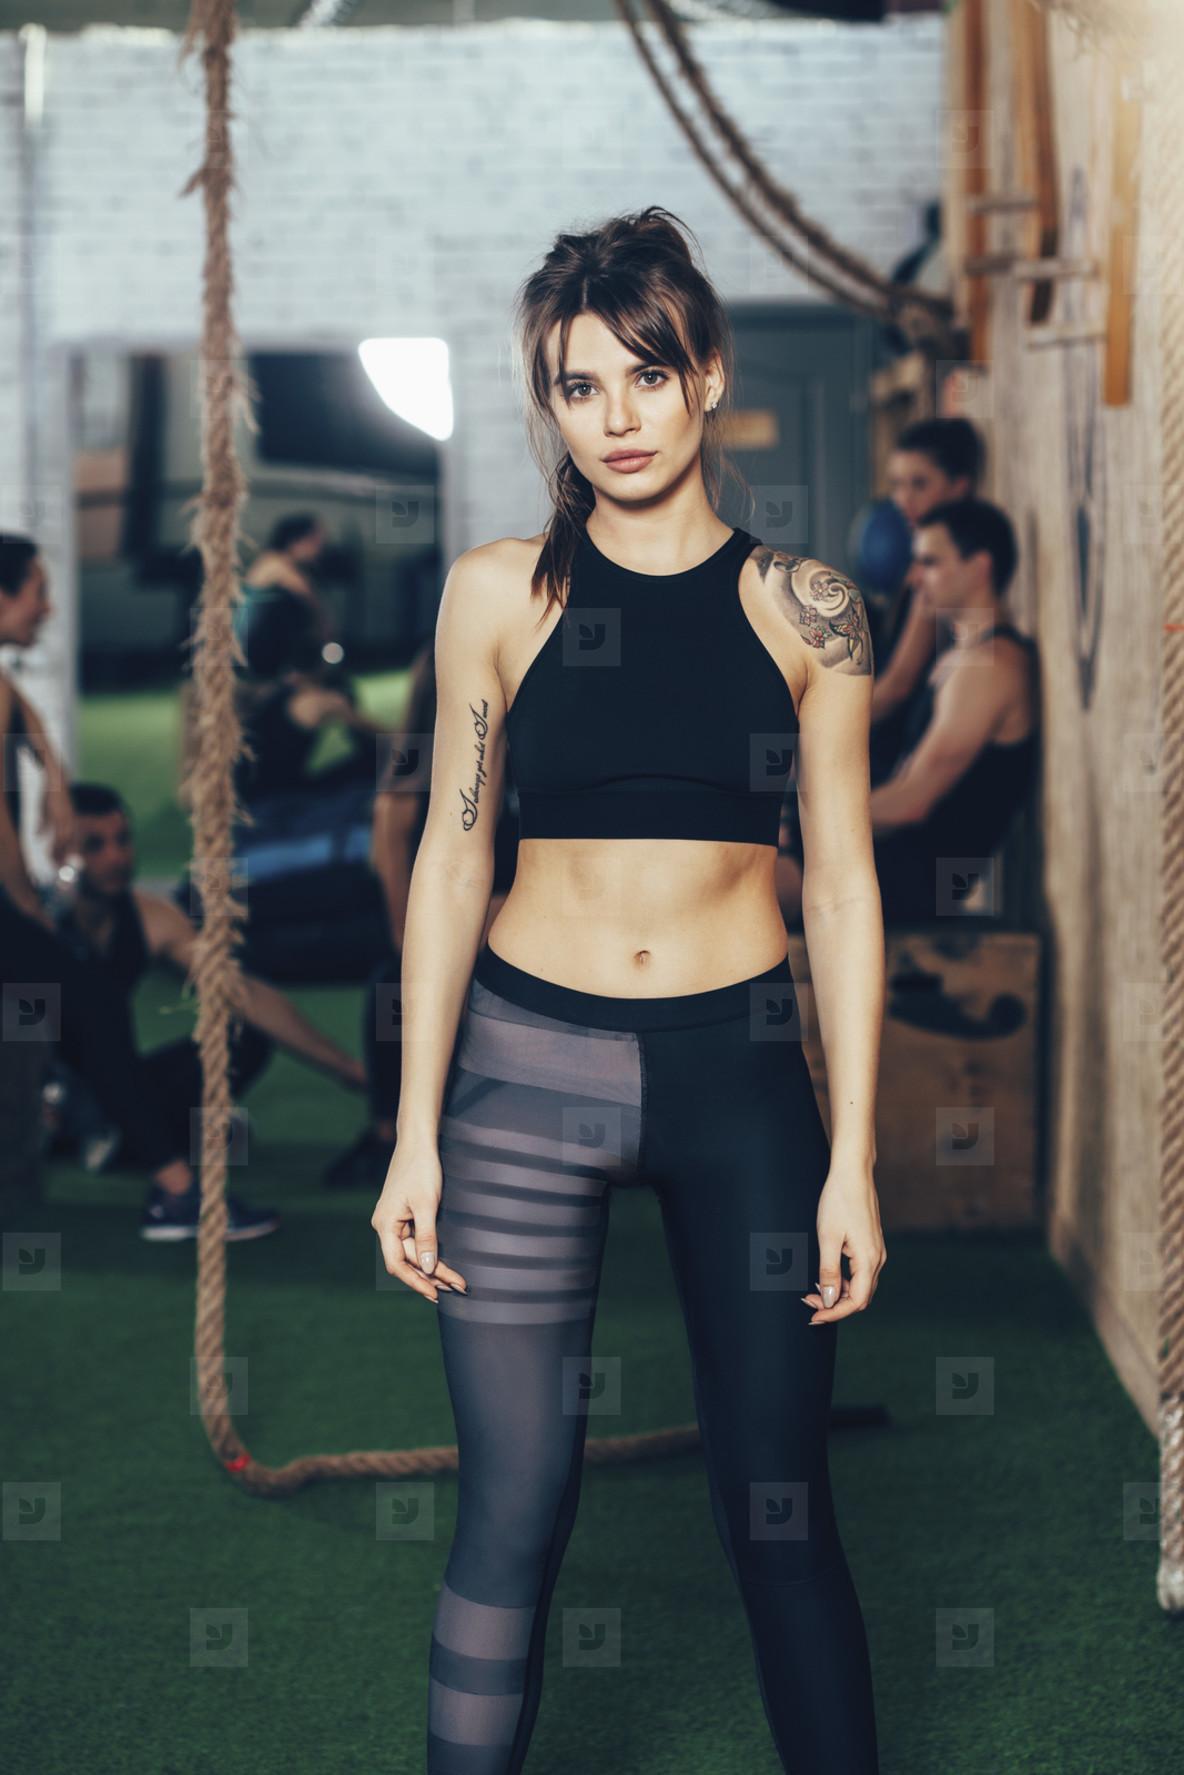 Crossfit Training  31